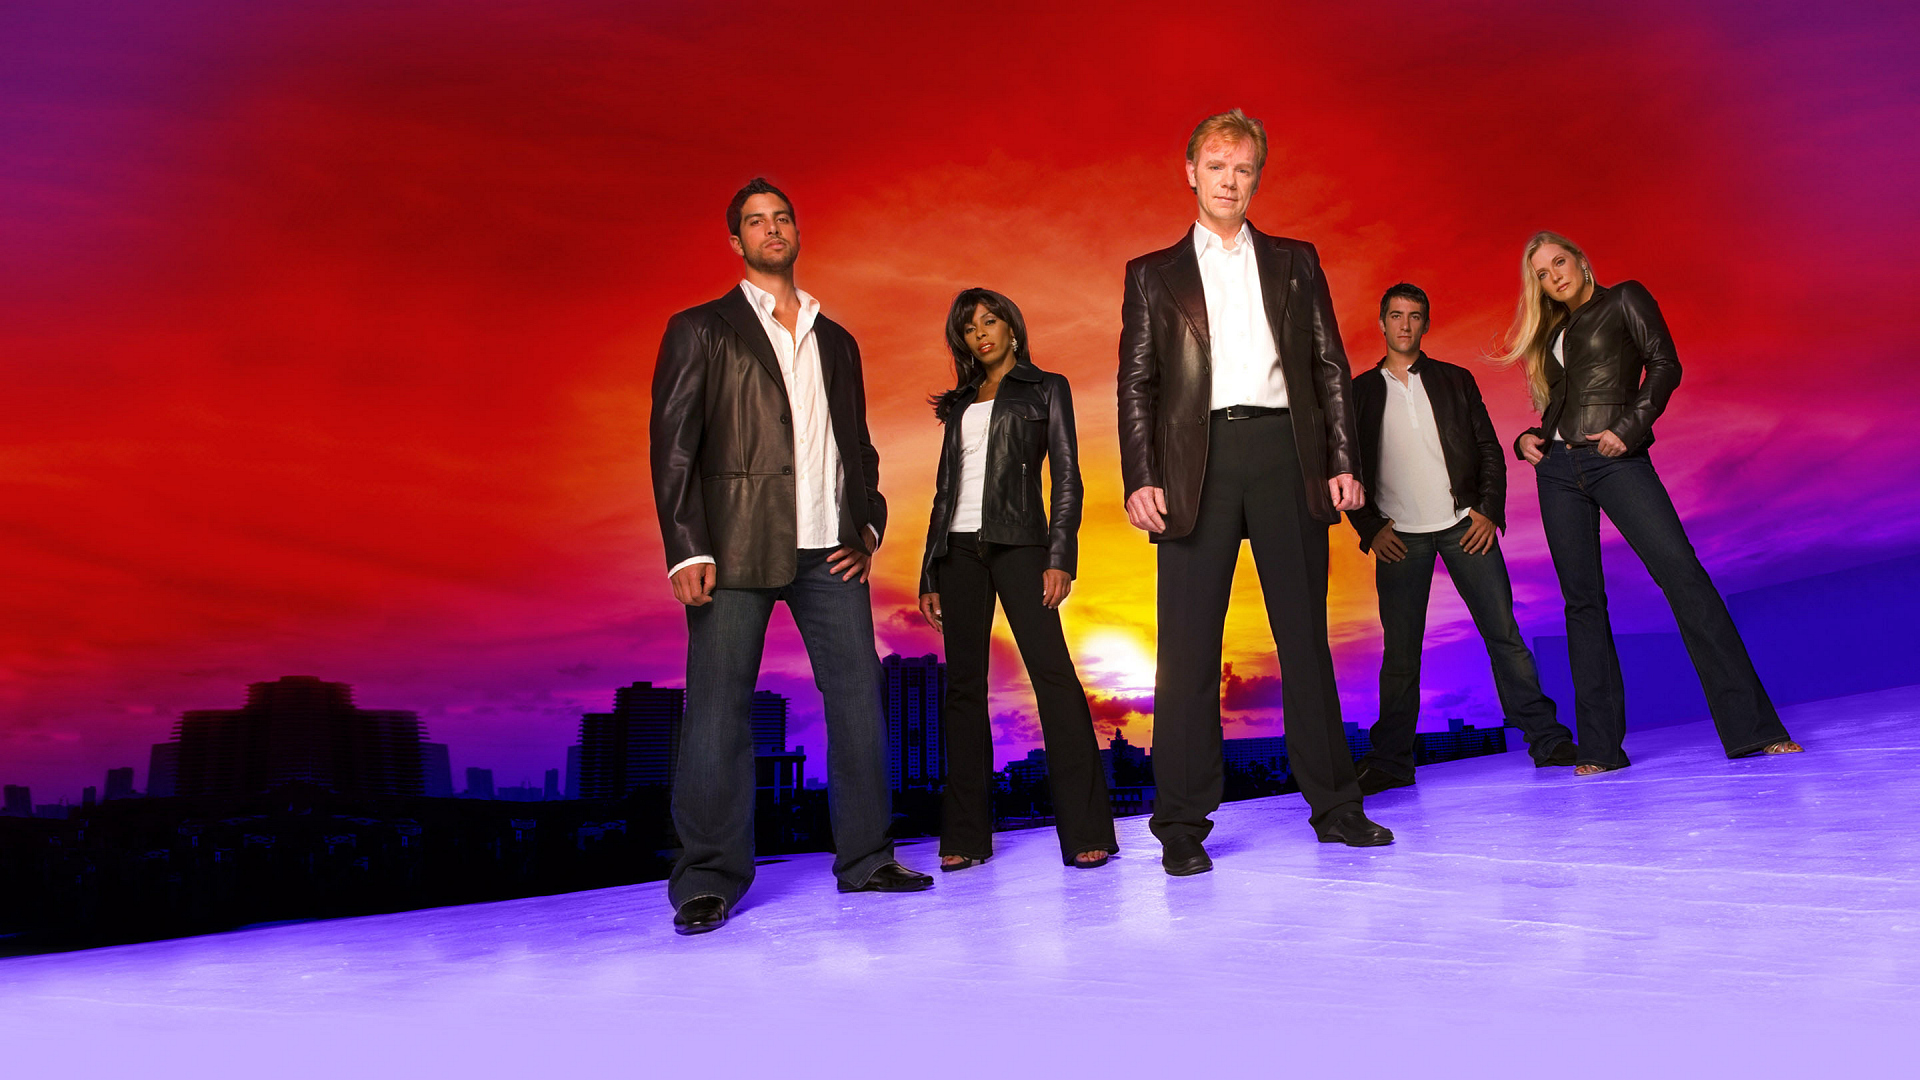 CSI: Miami - Watch Full Episodes Online - CBS com